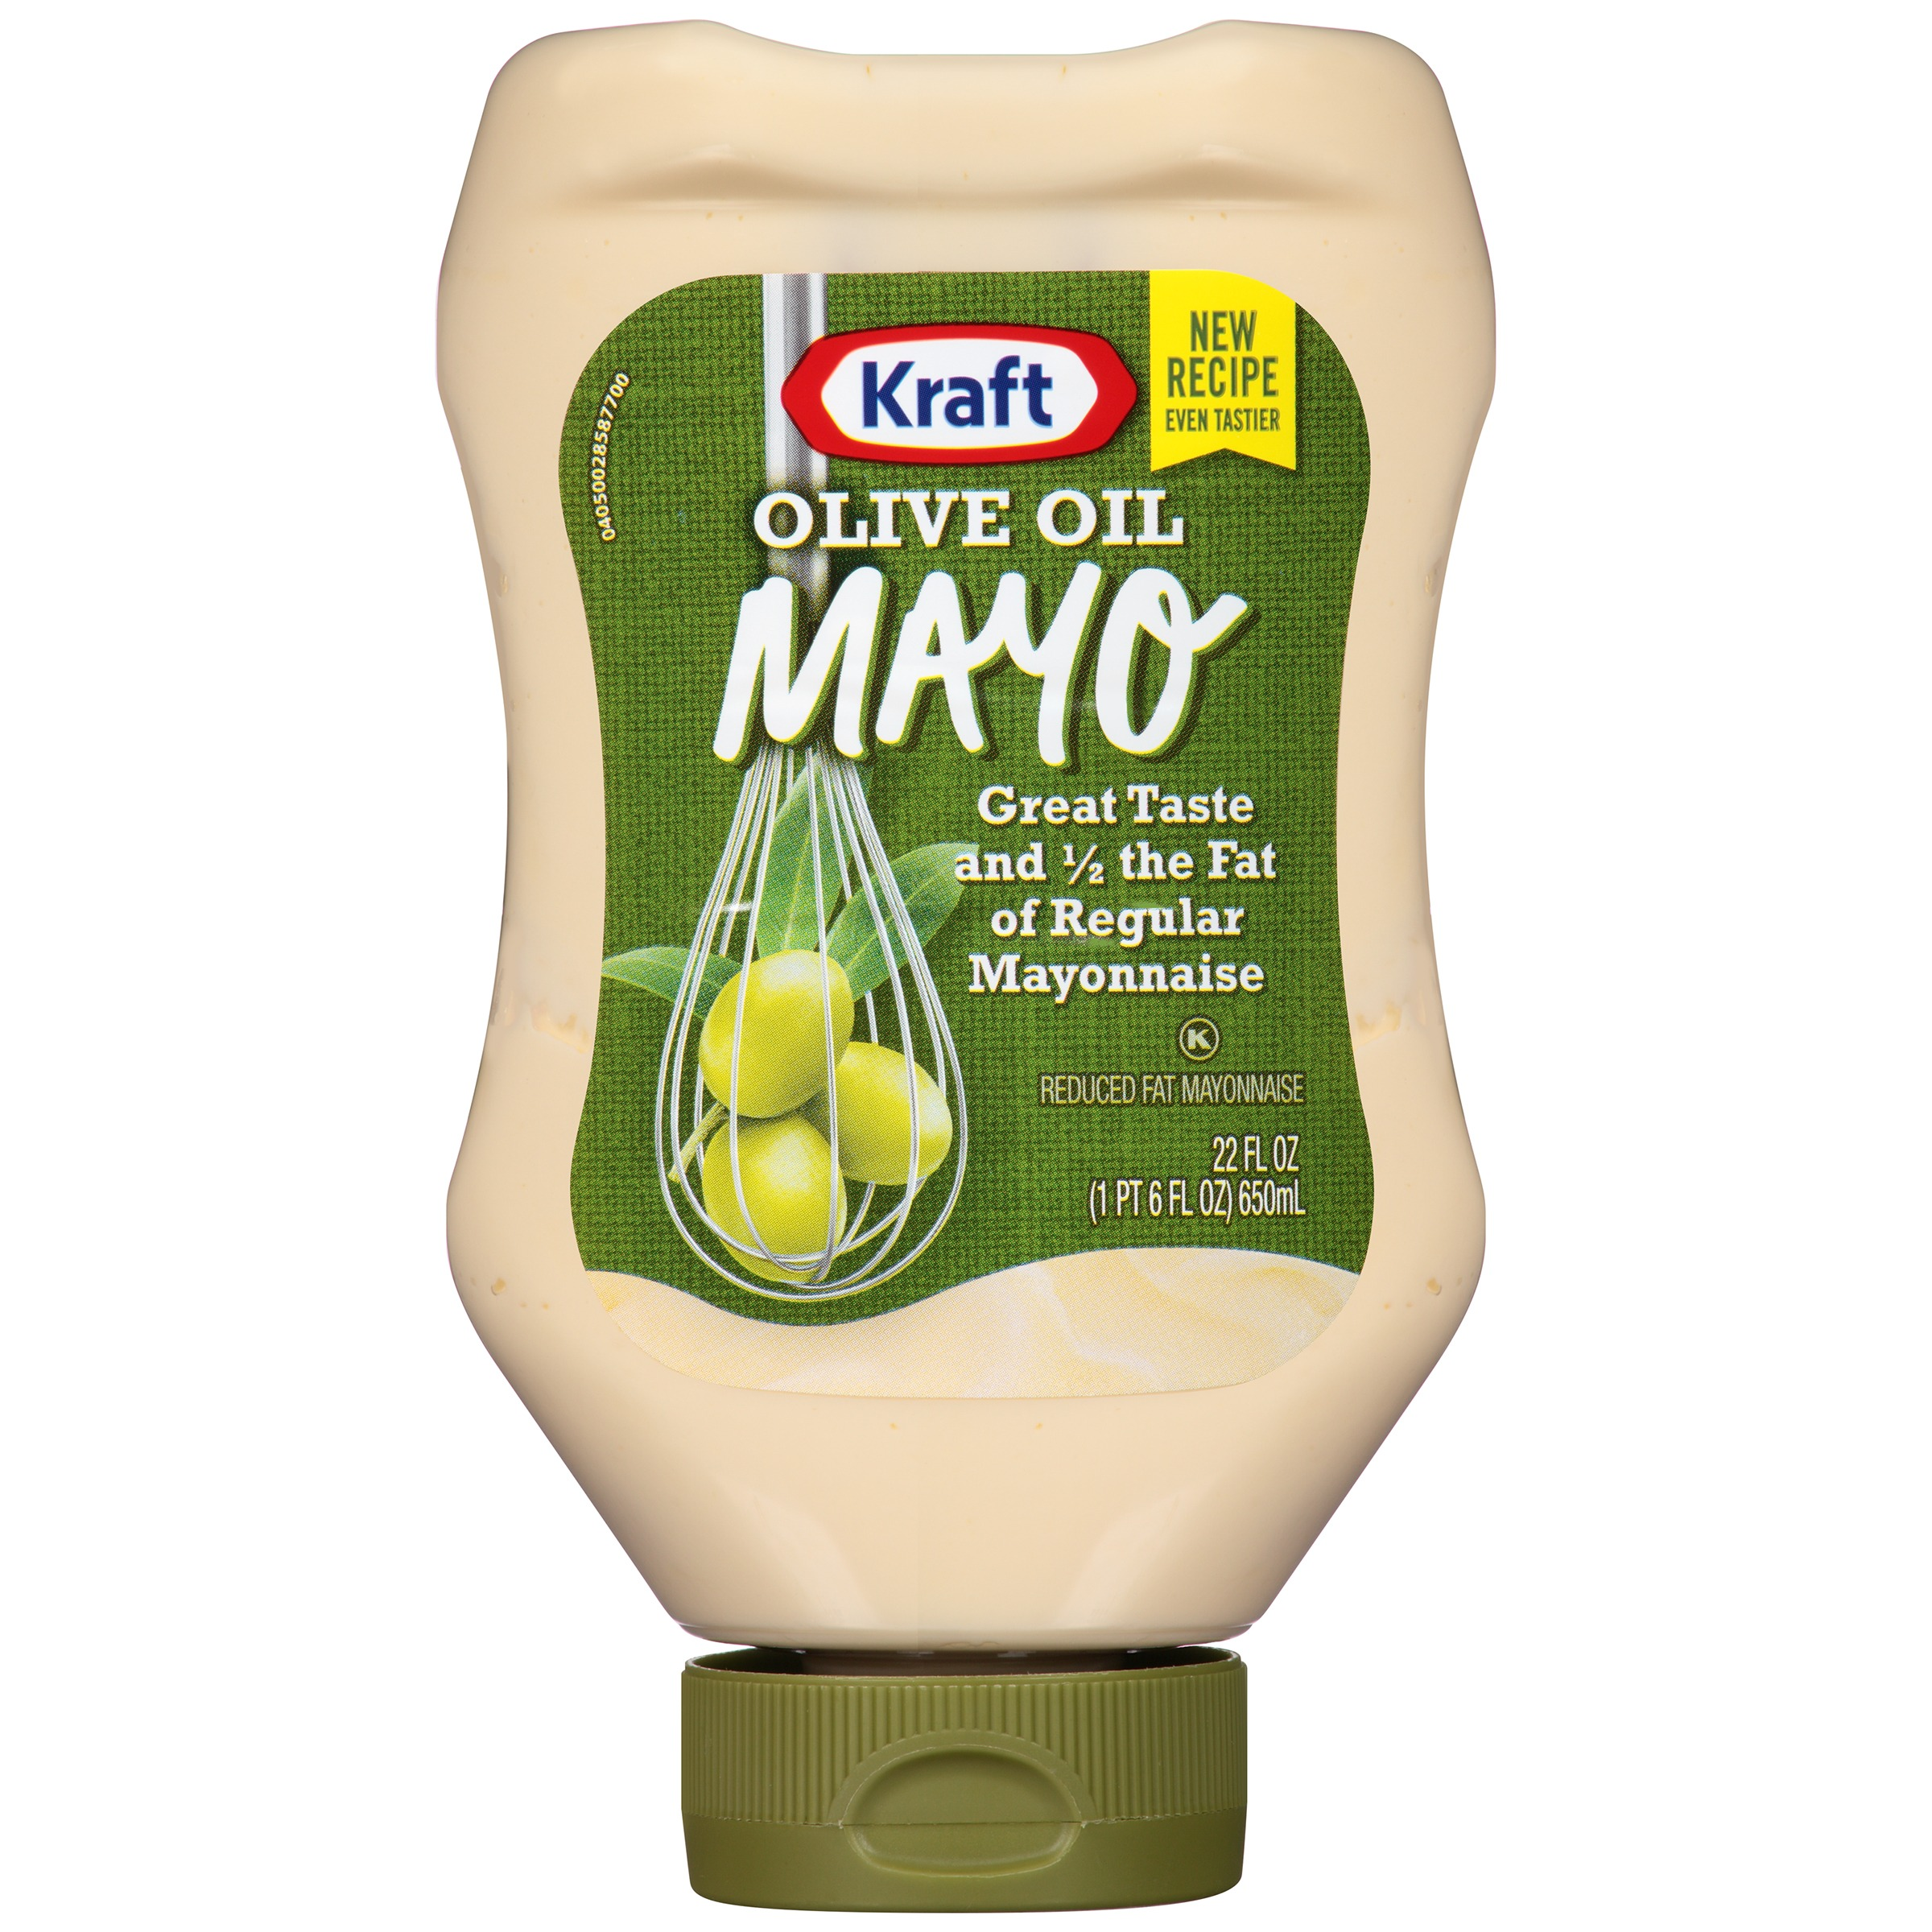 Kraft Olive Oil Reduced Fat Mayonnaise 22 fl. oz. Bottle